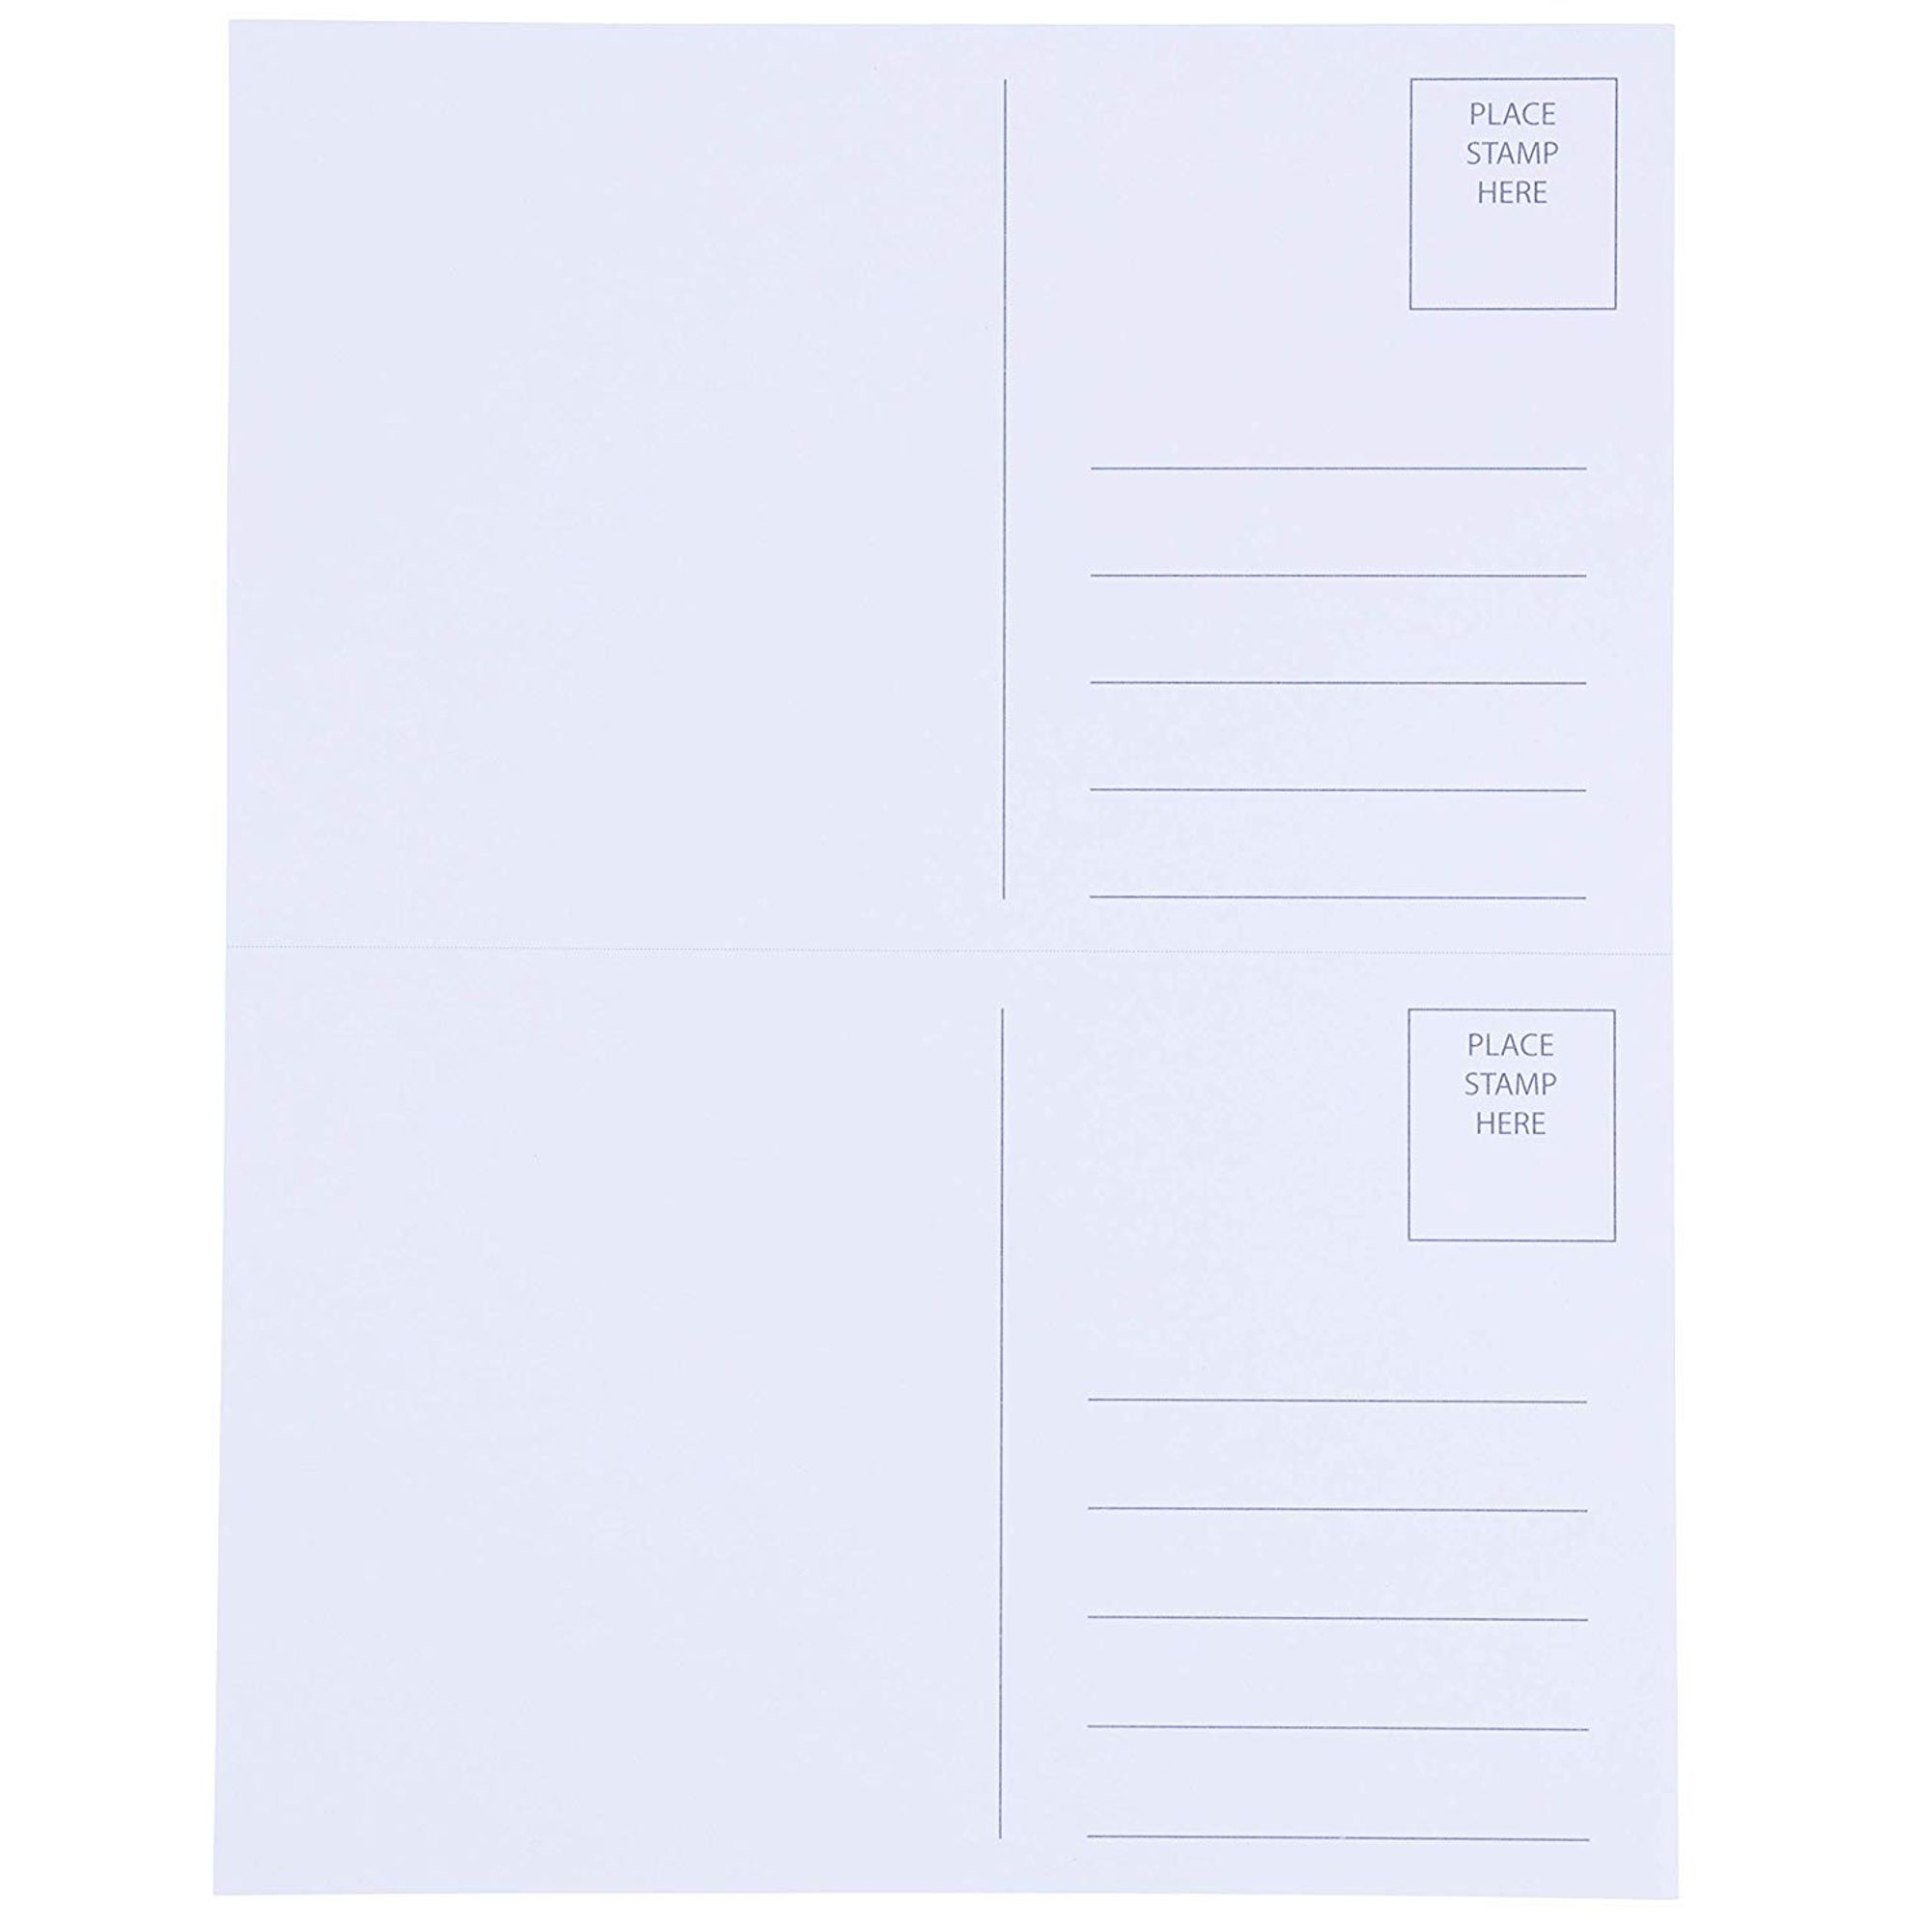 photograph relating to Printable Postcards known as Printable Postcards